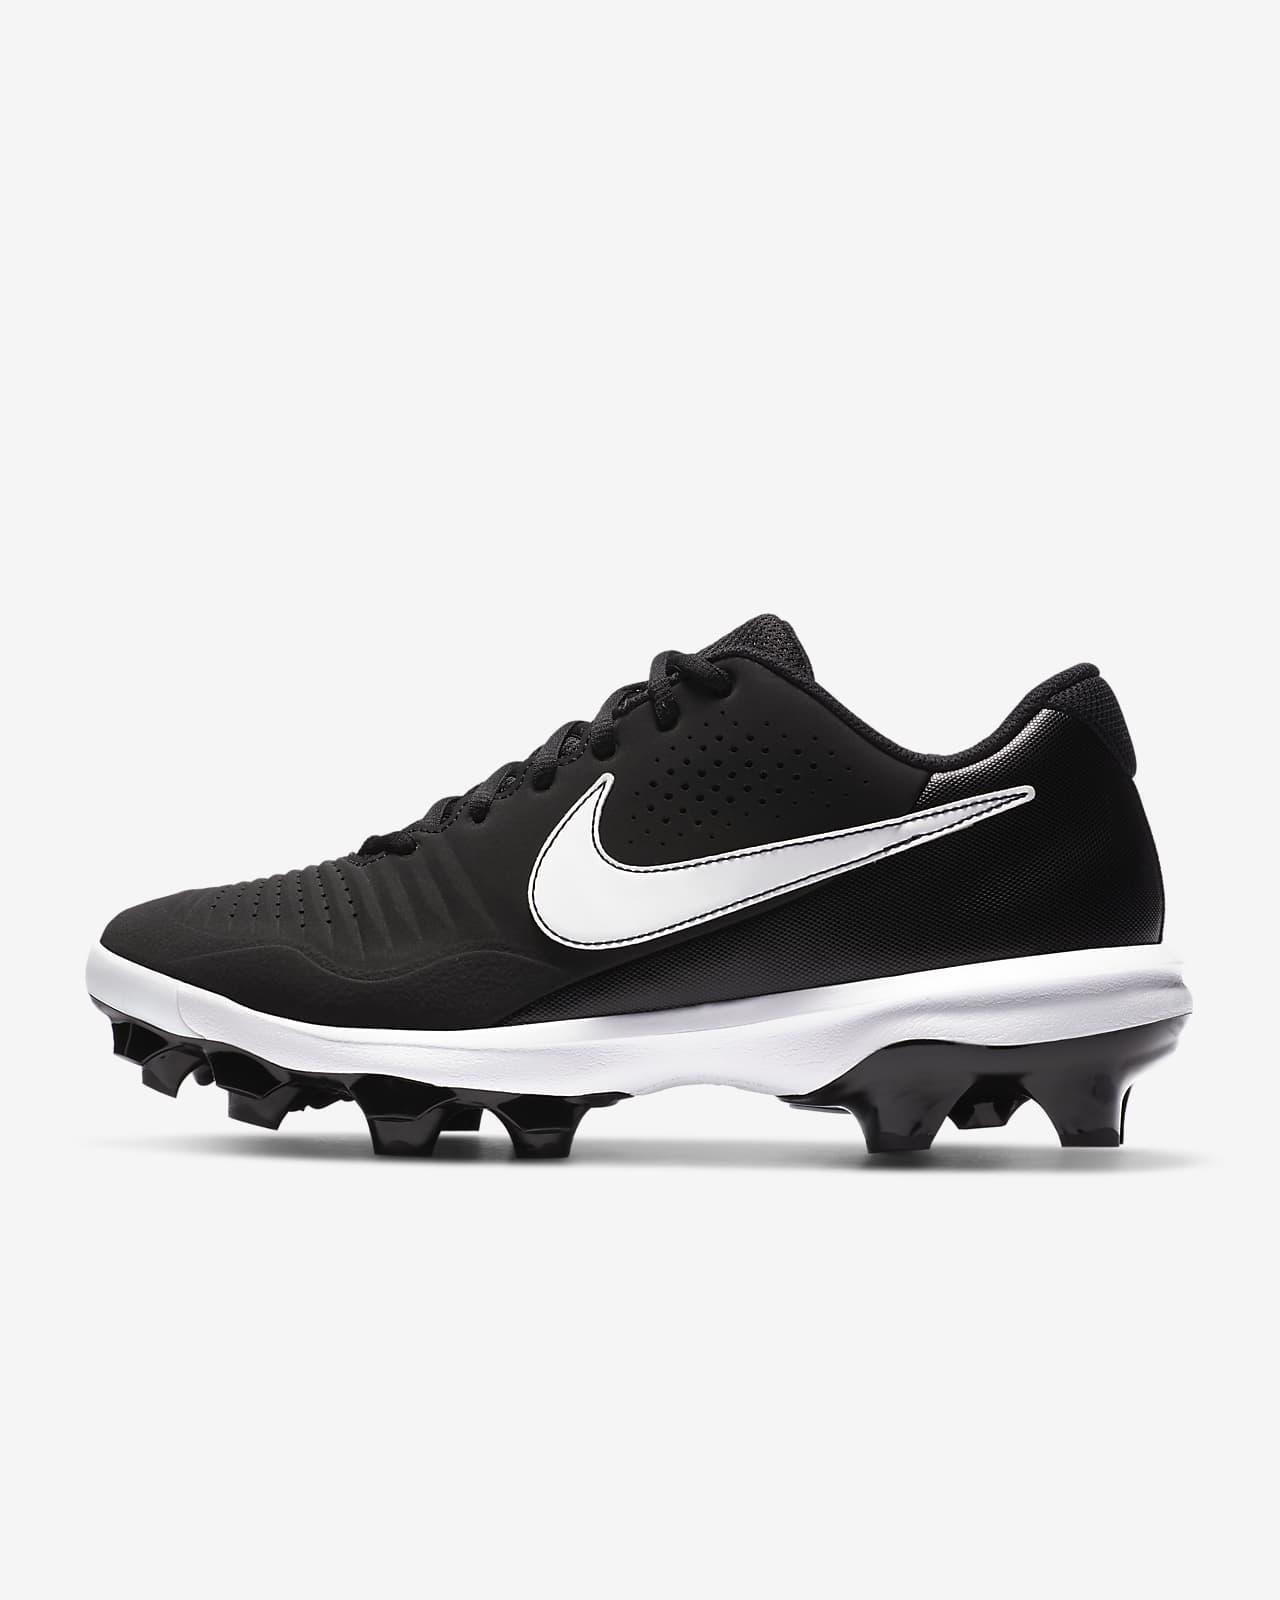 Baseball Cleats black//white Size 10 N-i-k-e